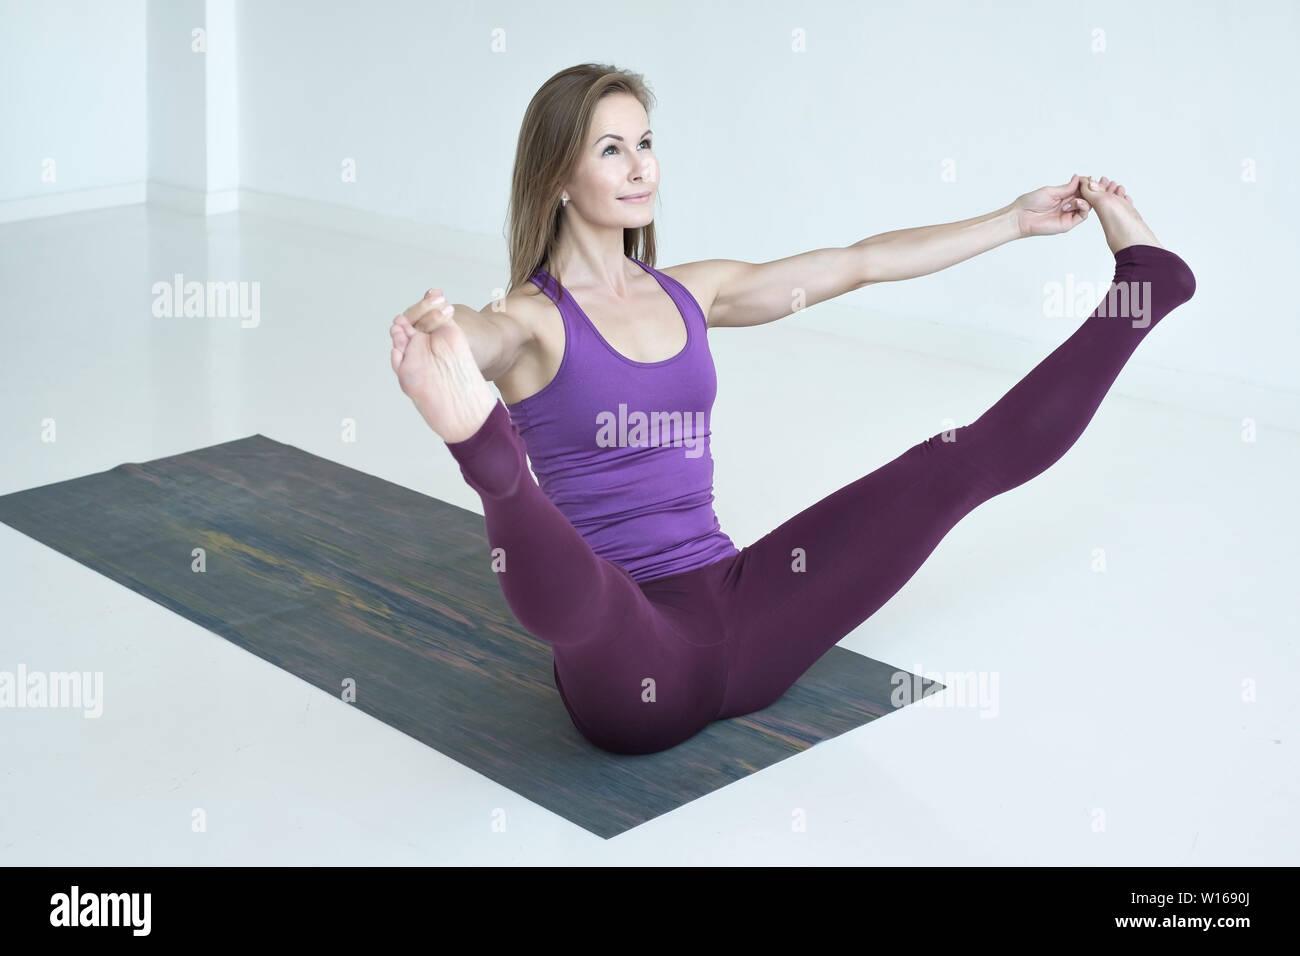 Woman practicing yoga, doing wide legged boat exercise, Prasarita Navasana pose - Stock Image